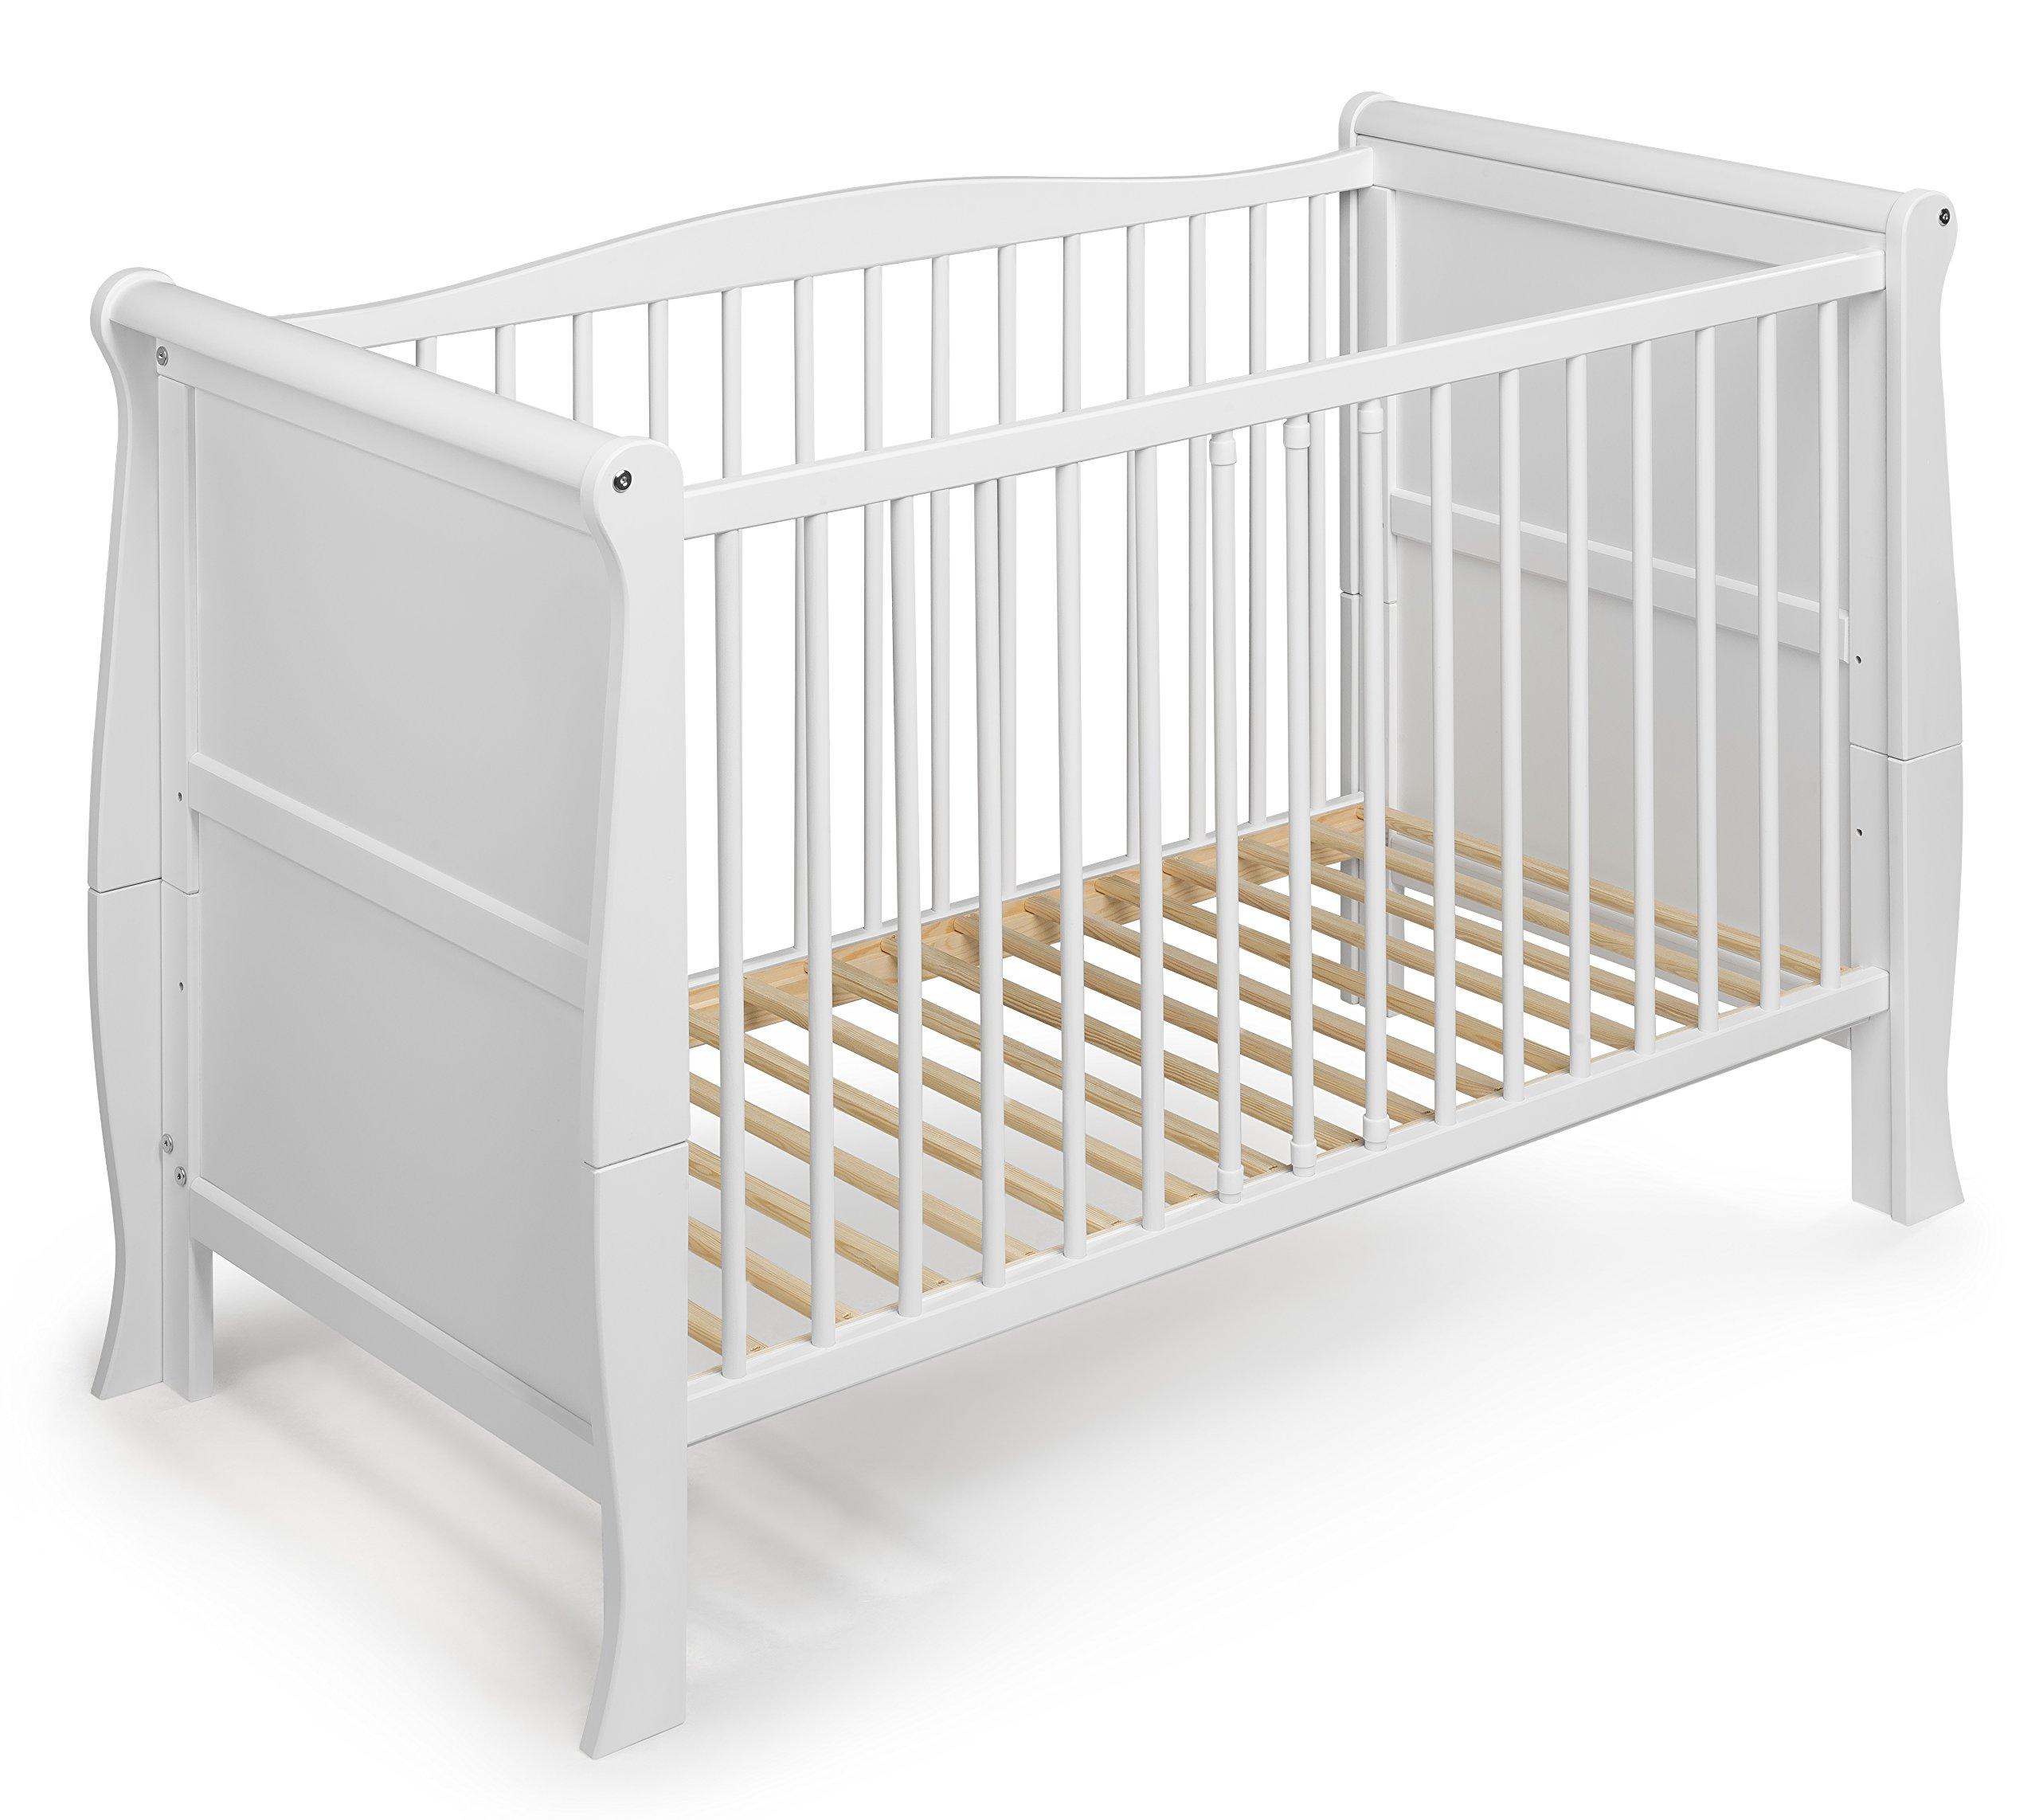 Brillant Chicco Babywiege Babybett Baby Hug 4 In 1 Design 2019 Baby